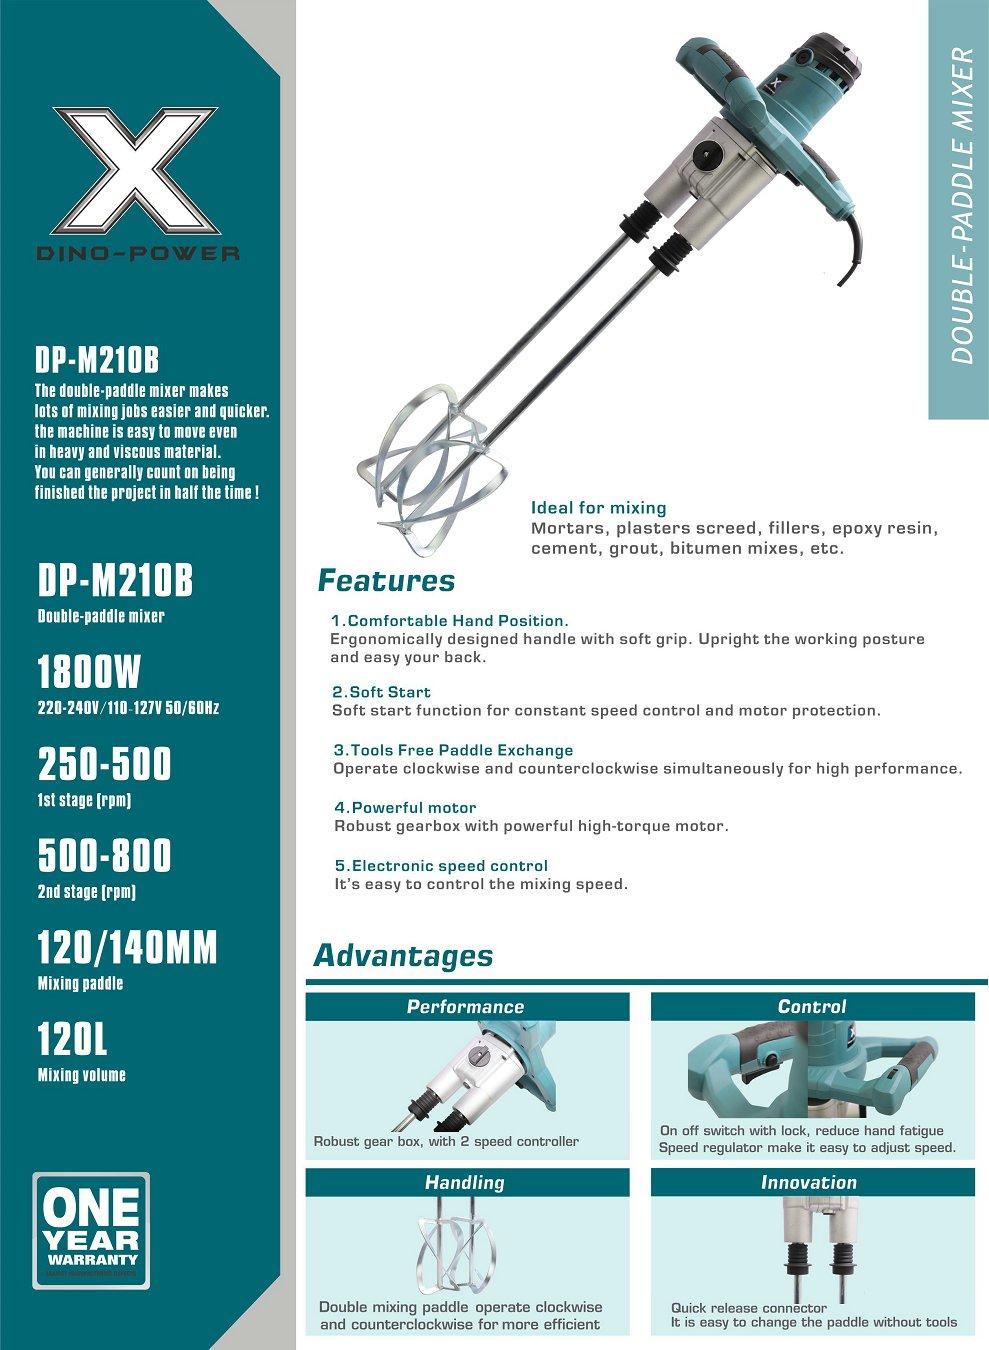 DP-M210B DOUBLE PADDLE MIXER